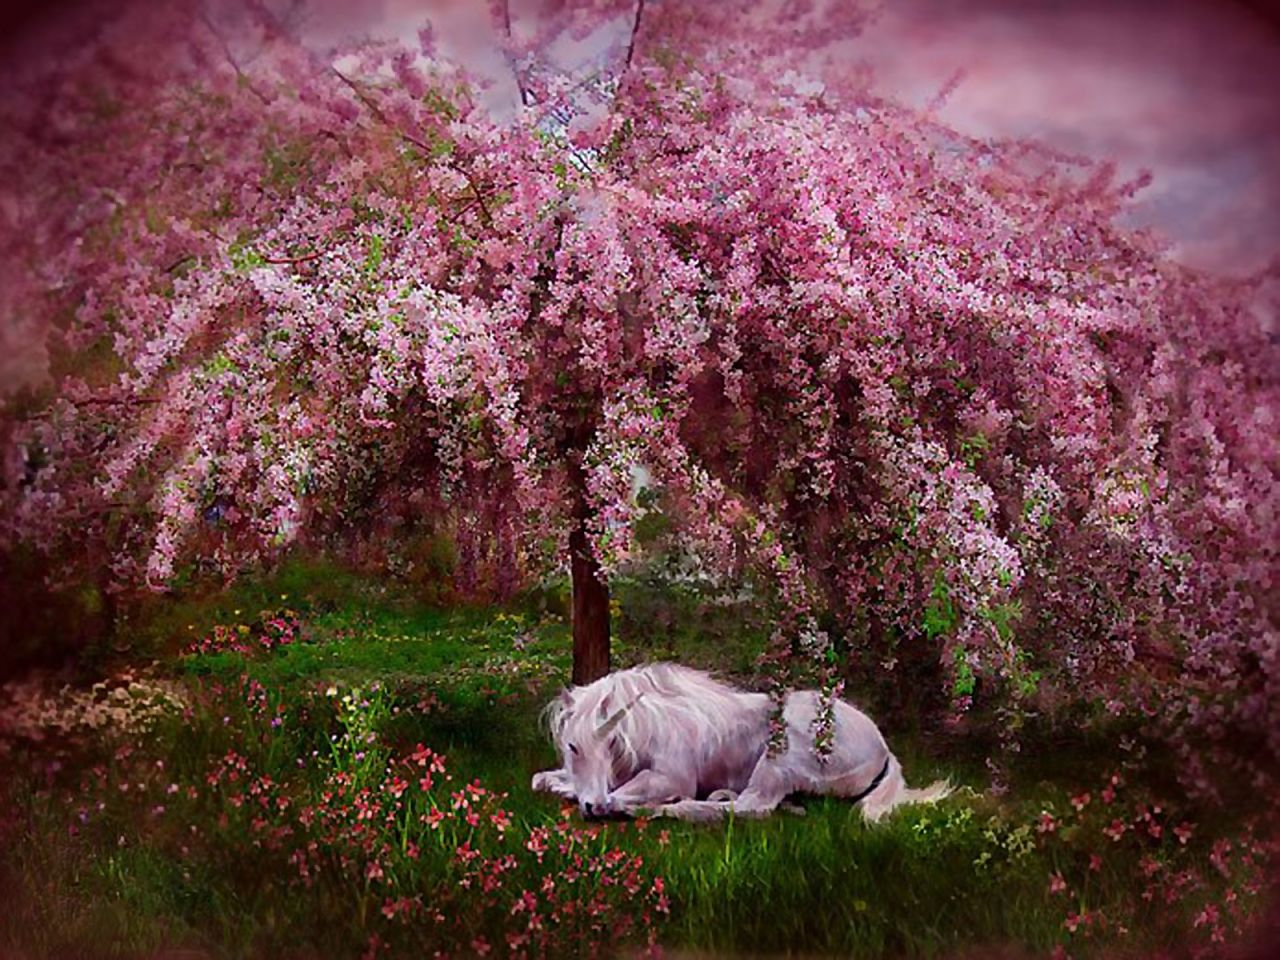 Unicorn Under Cherry Blossom Tree Unicorn Art Dream Art Posters Art Prints